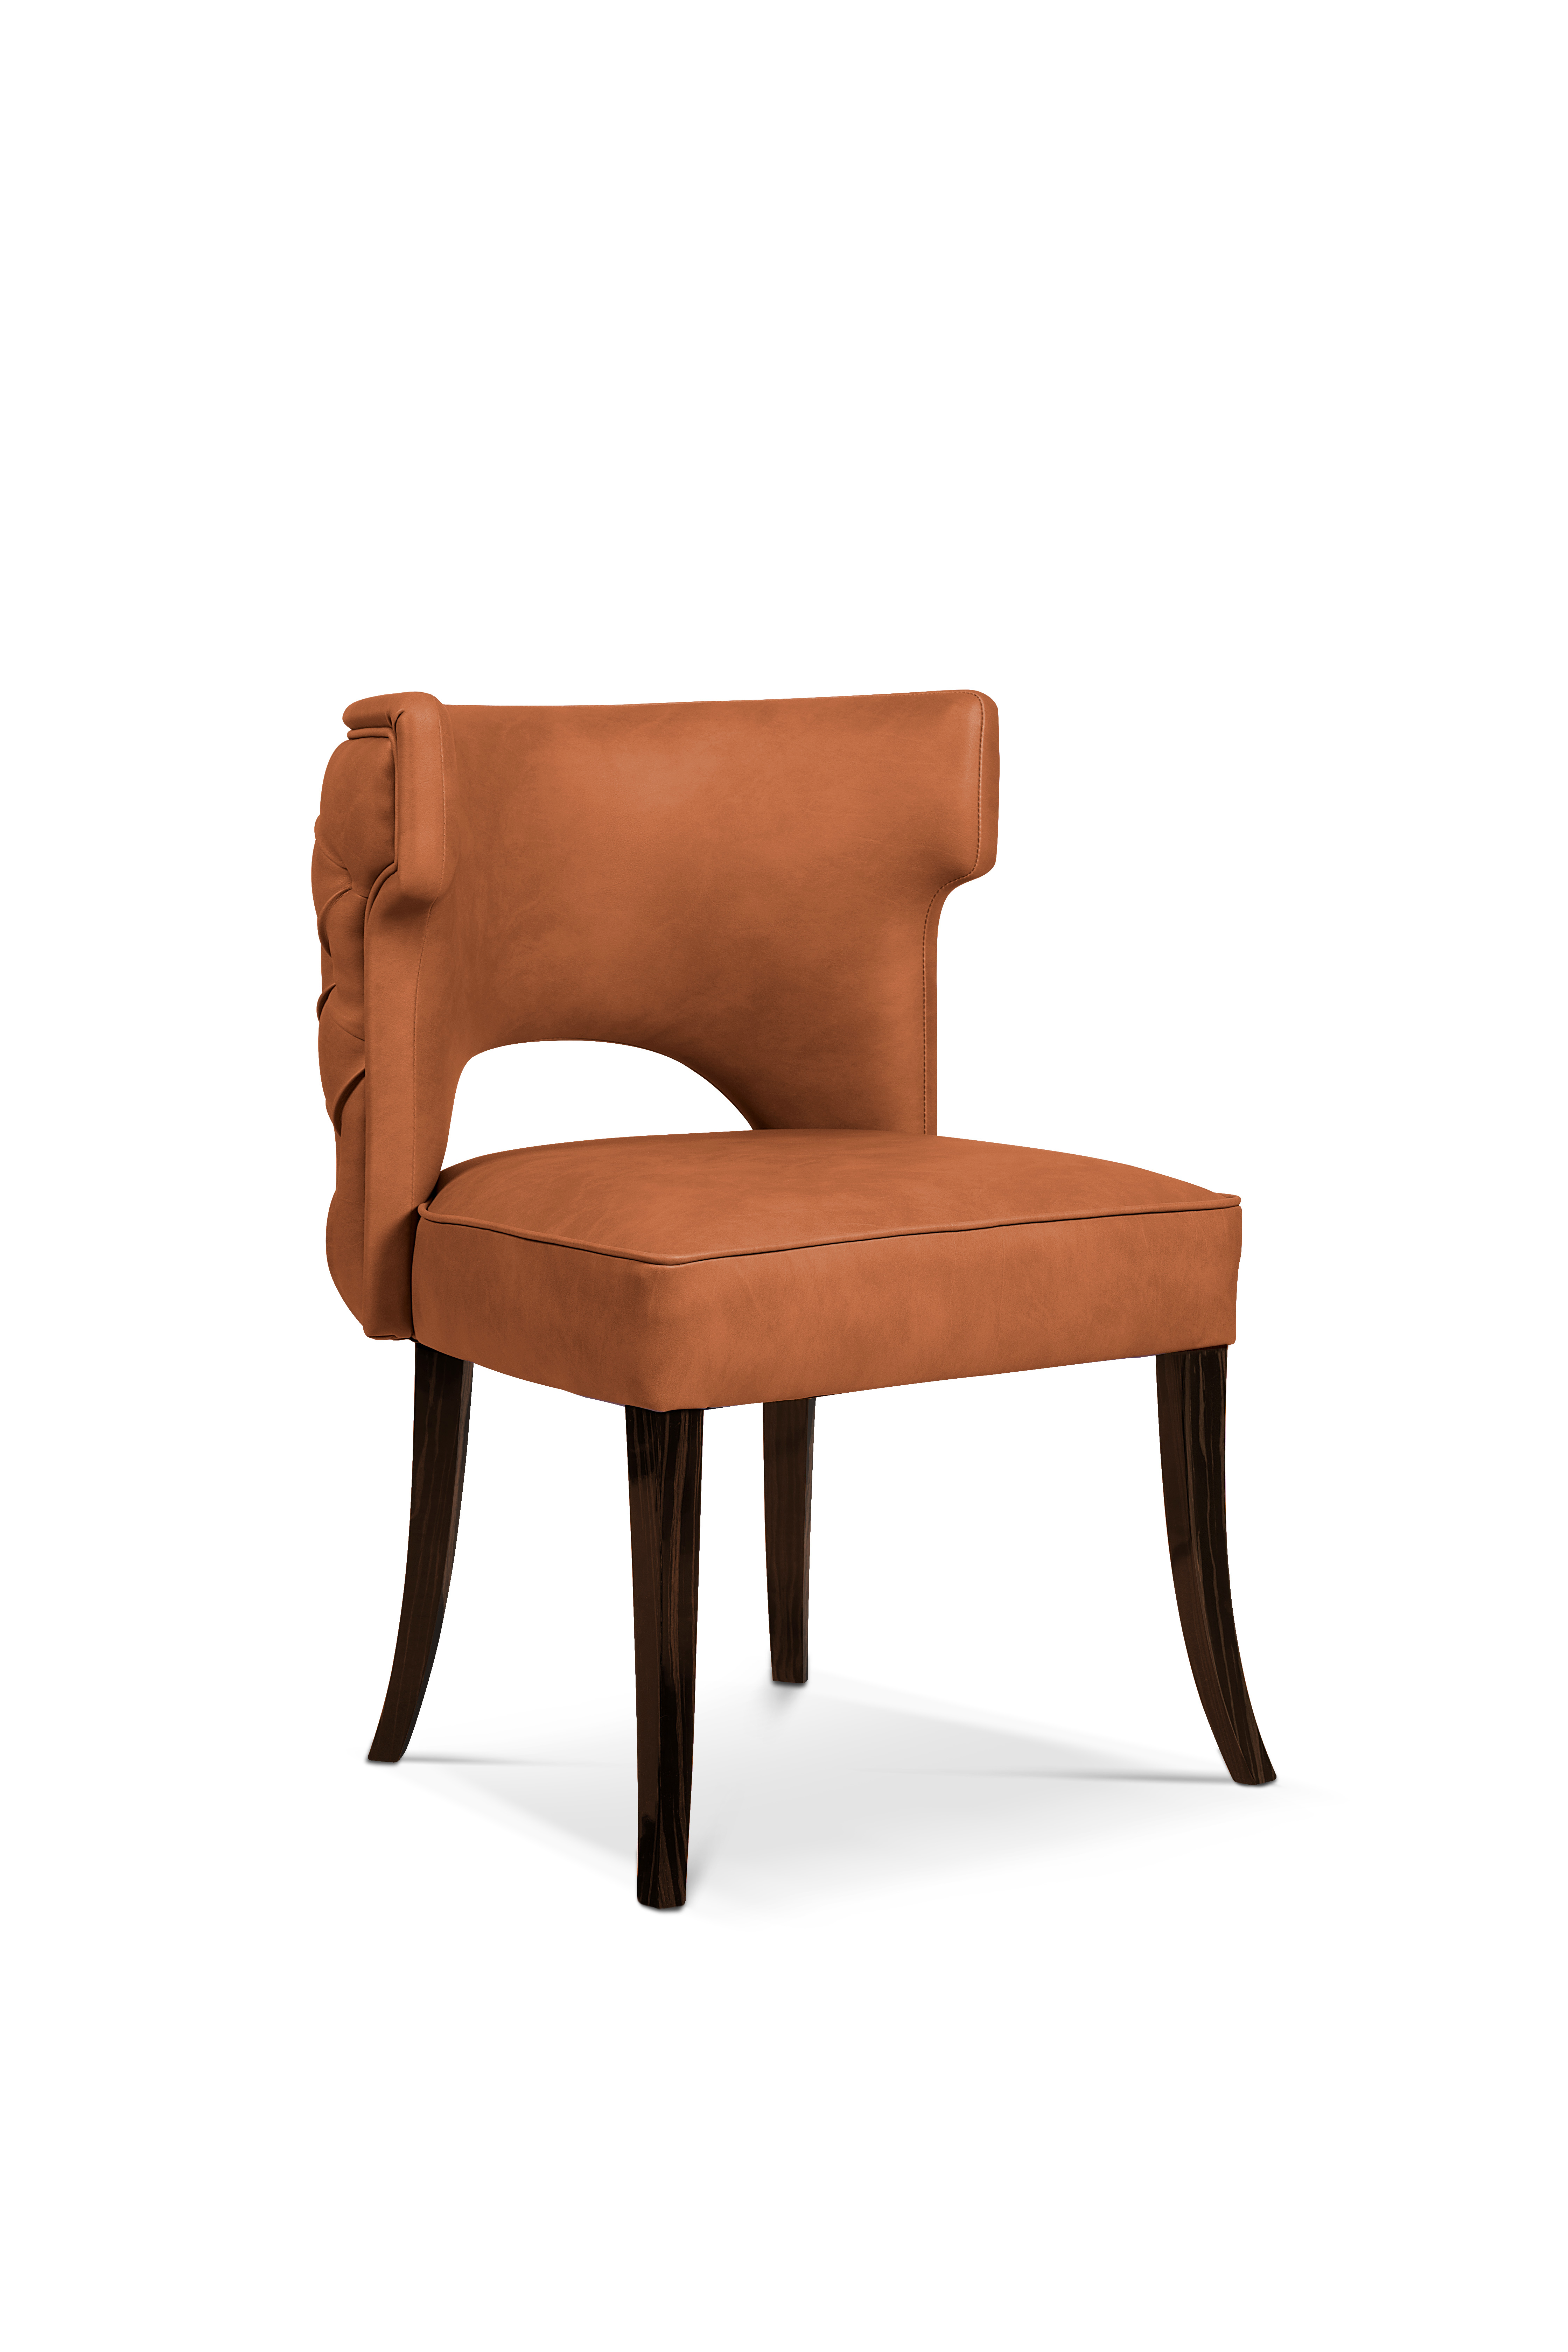 Kansas Dining Chair Mid Century Design By Brabbu